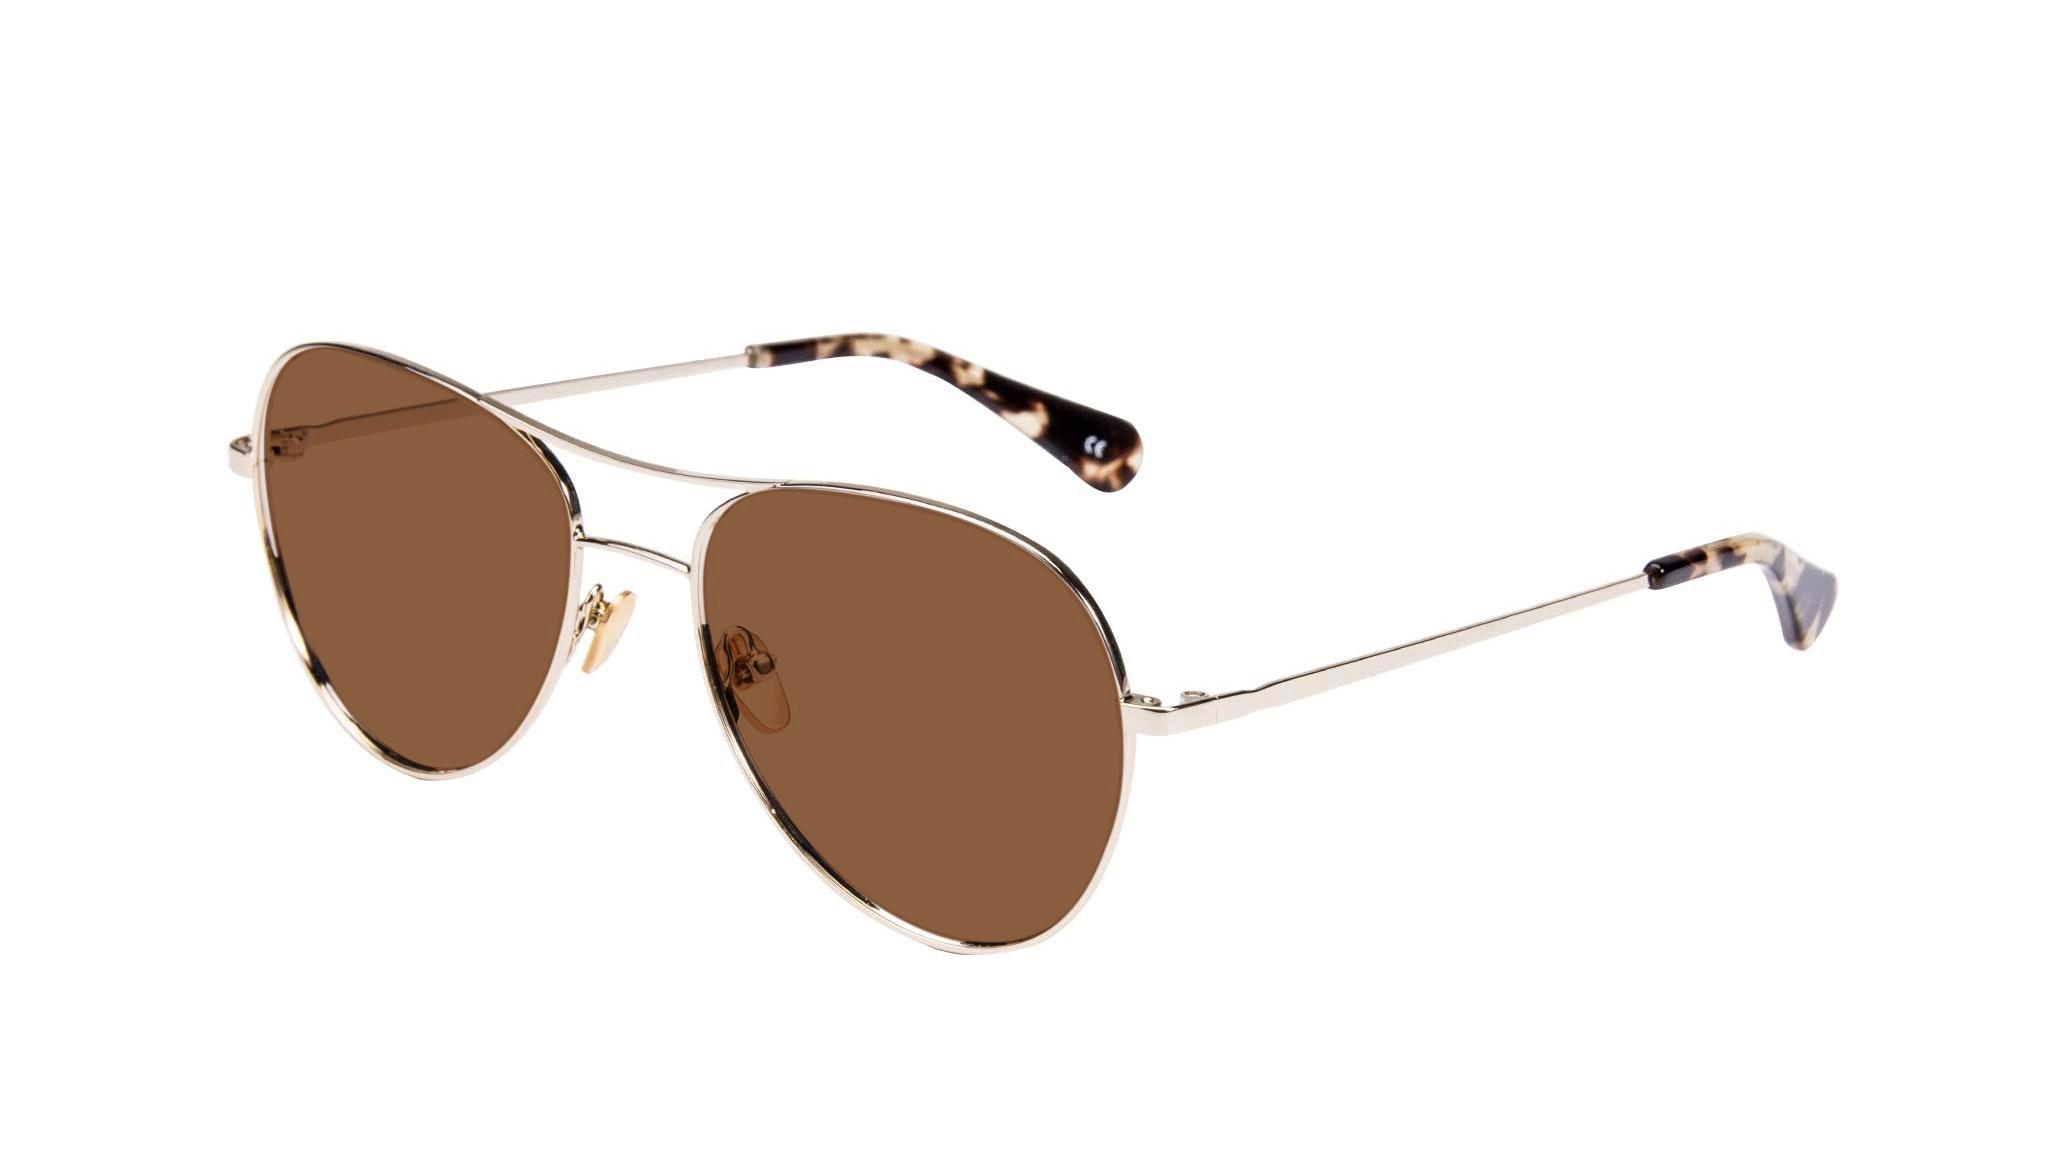 Affordable Fashion Glasses Aviator Sunglasses Women Want Gold Tilt